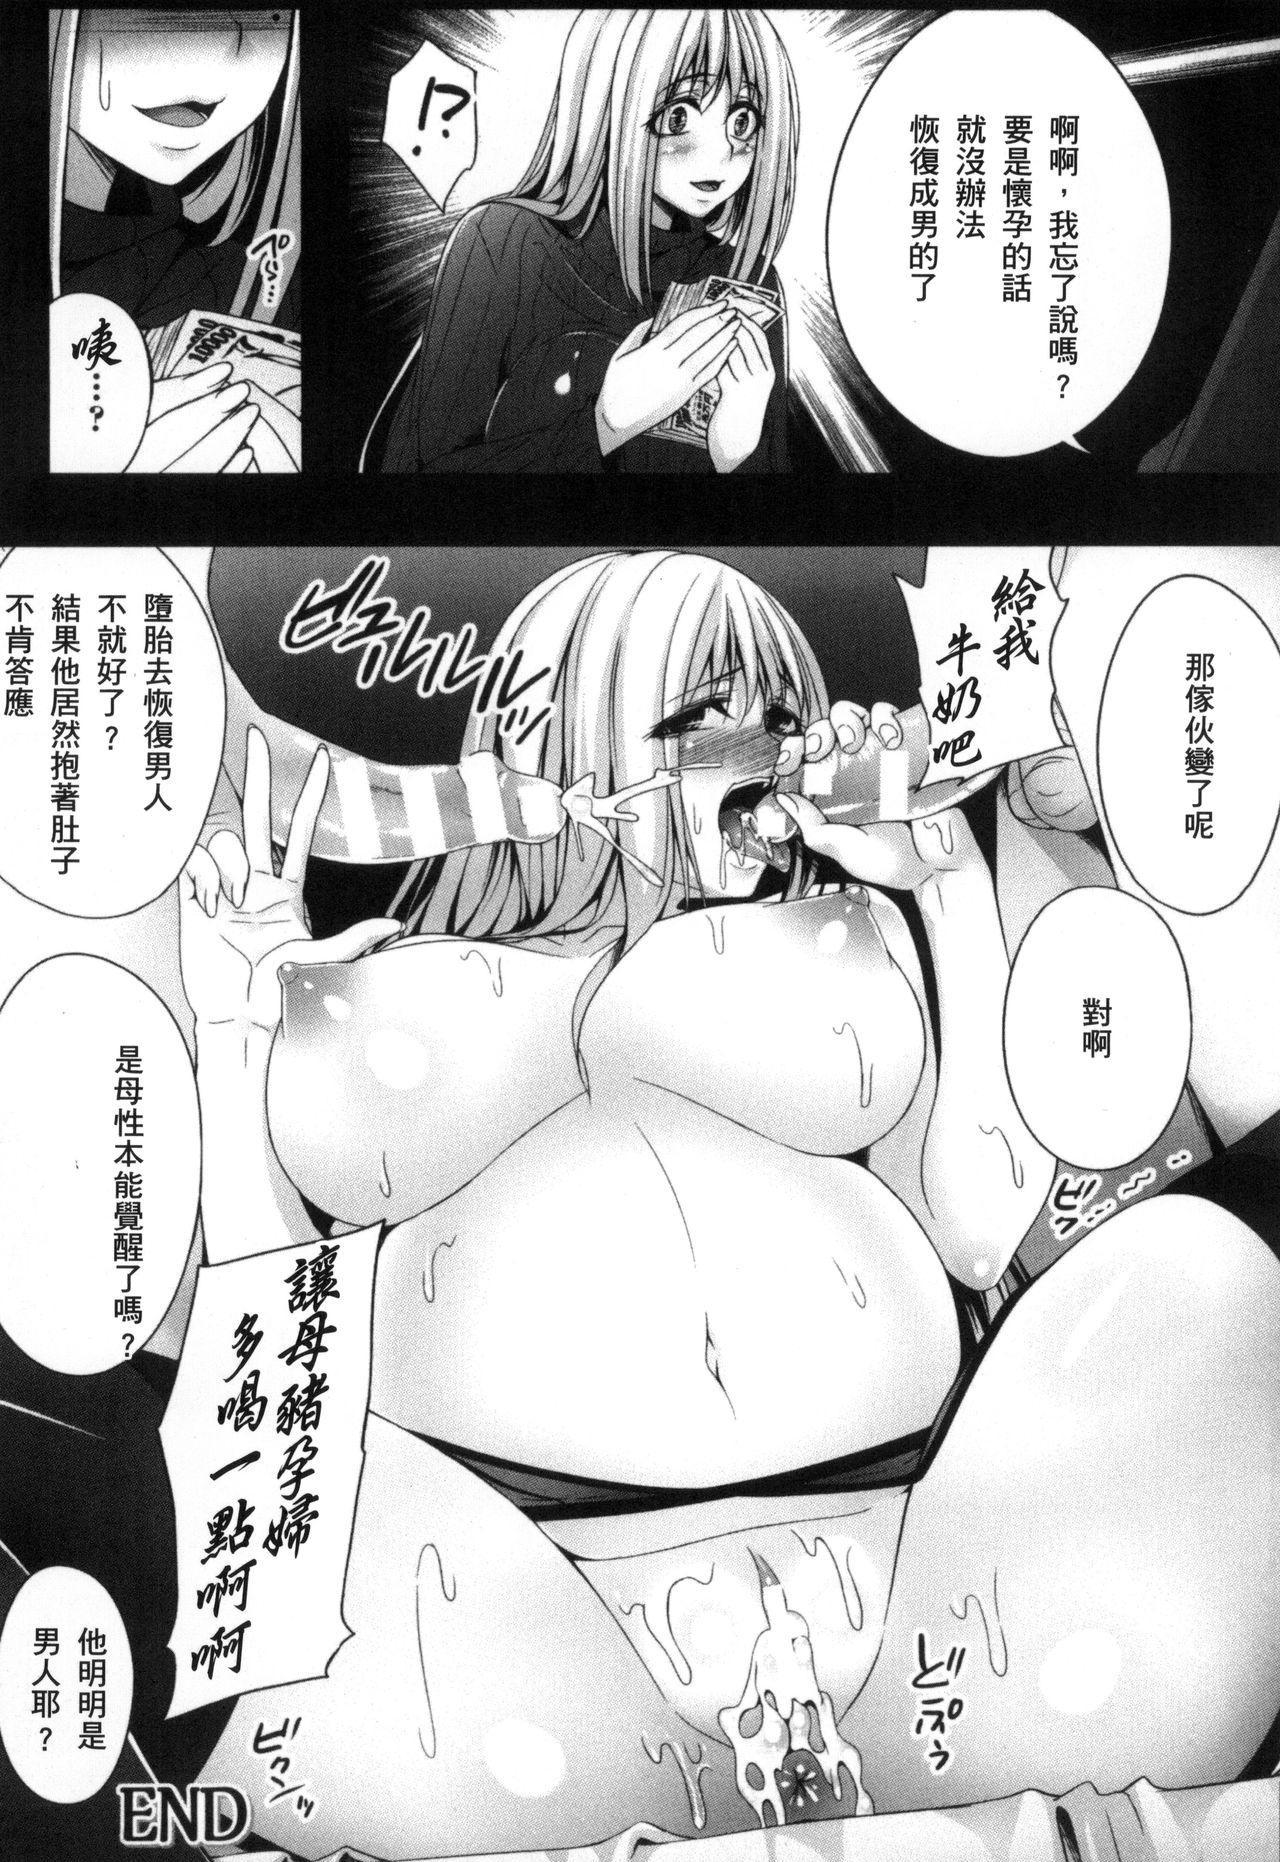 2D Comic Magazine Seitenkan Shite Haramasarete Botebara End! | 性轉換與懷孕,滿腹精液收場! 84